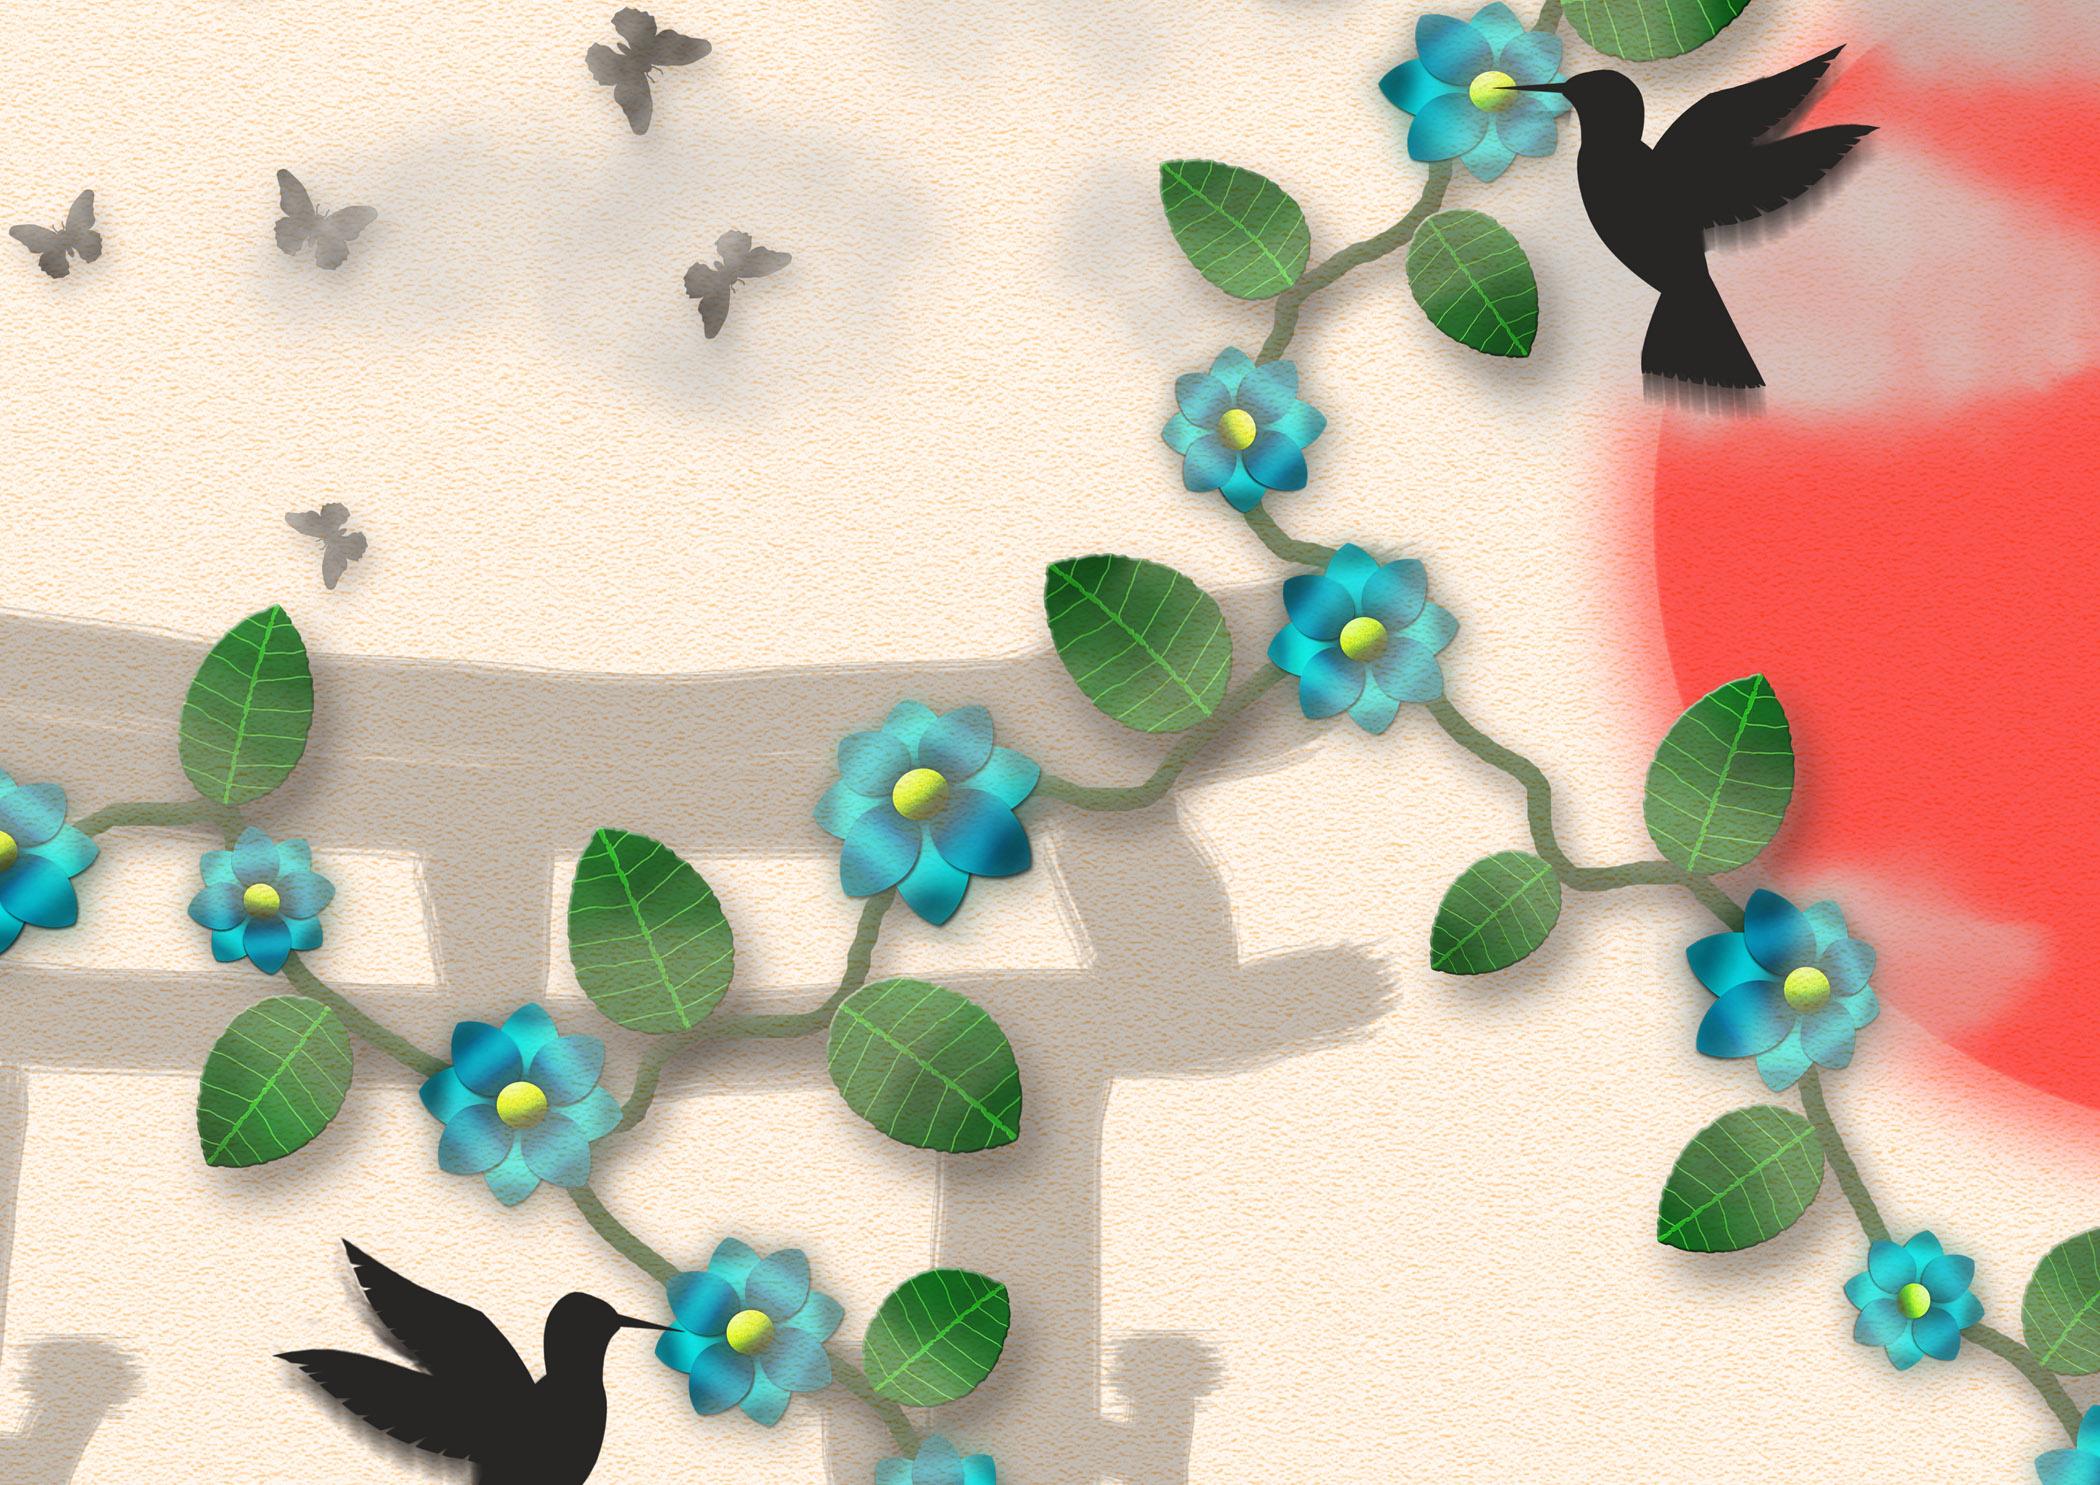 Japanese inspired shadowplay